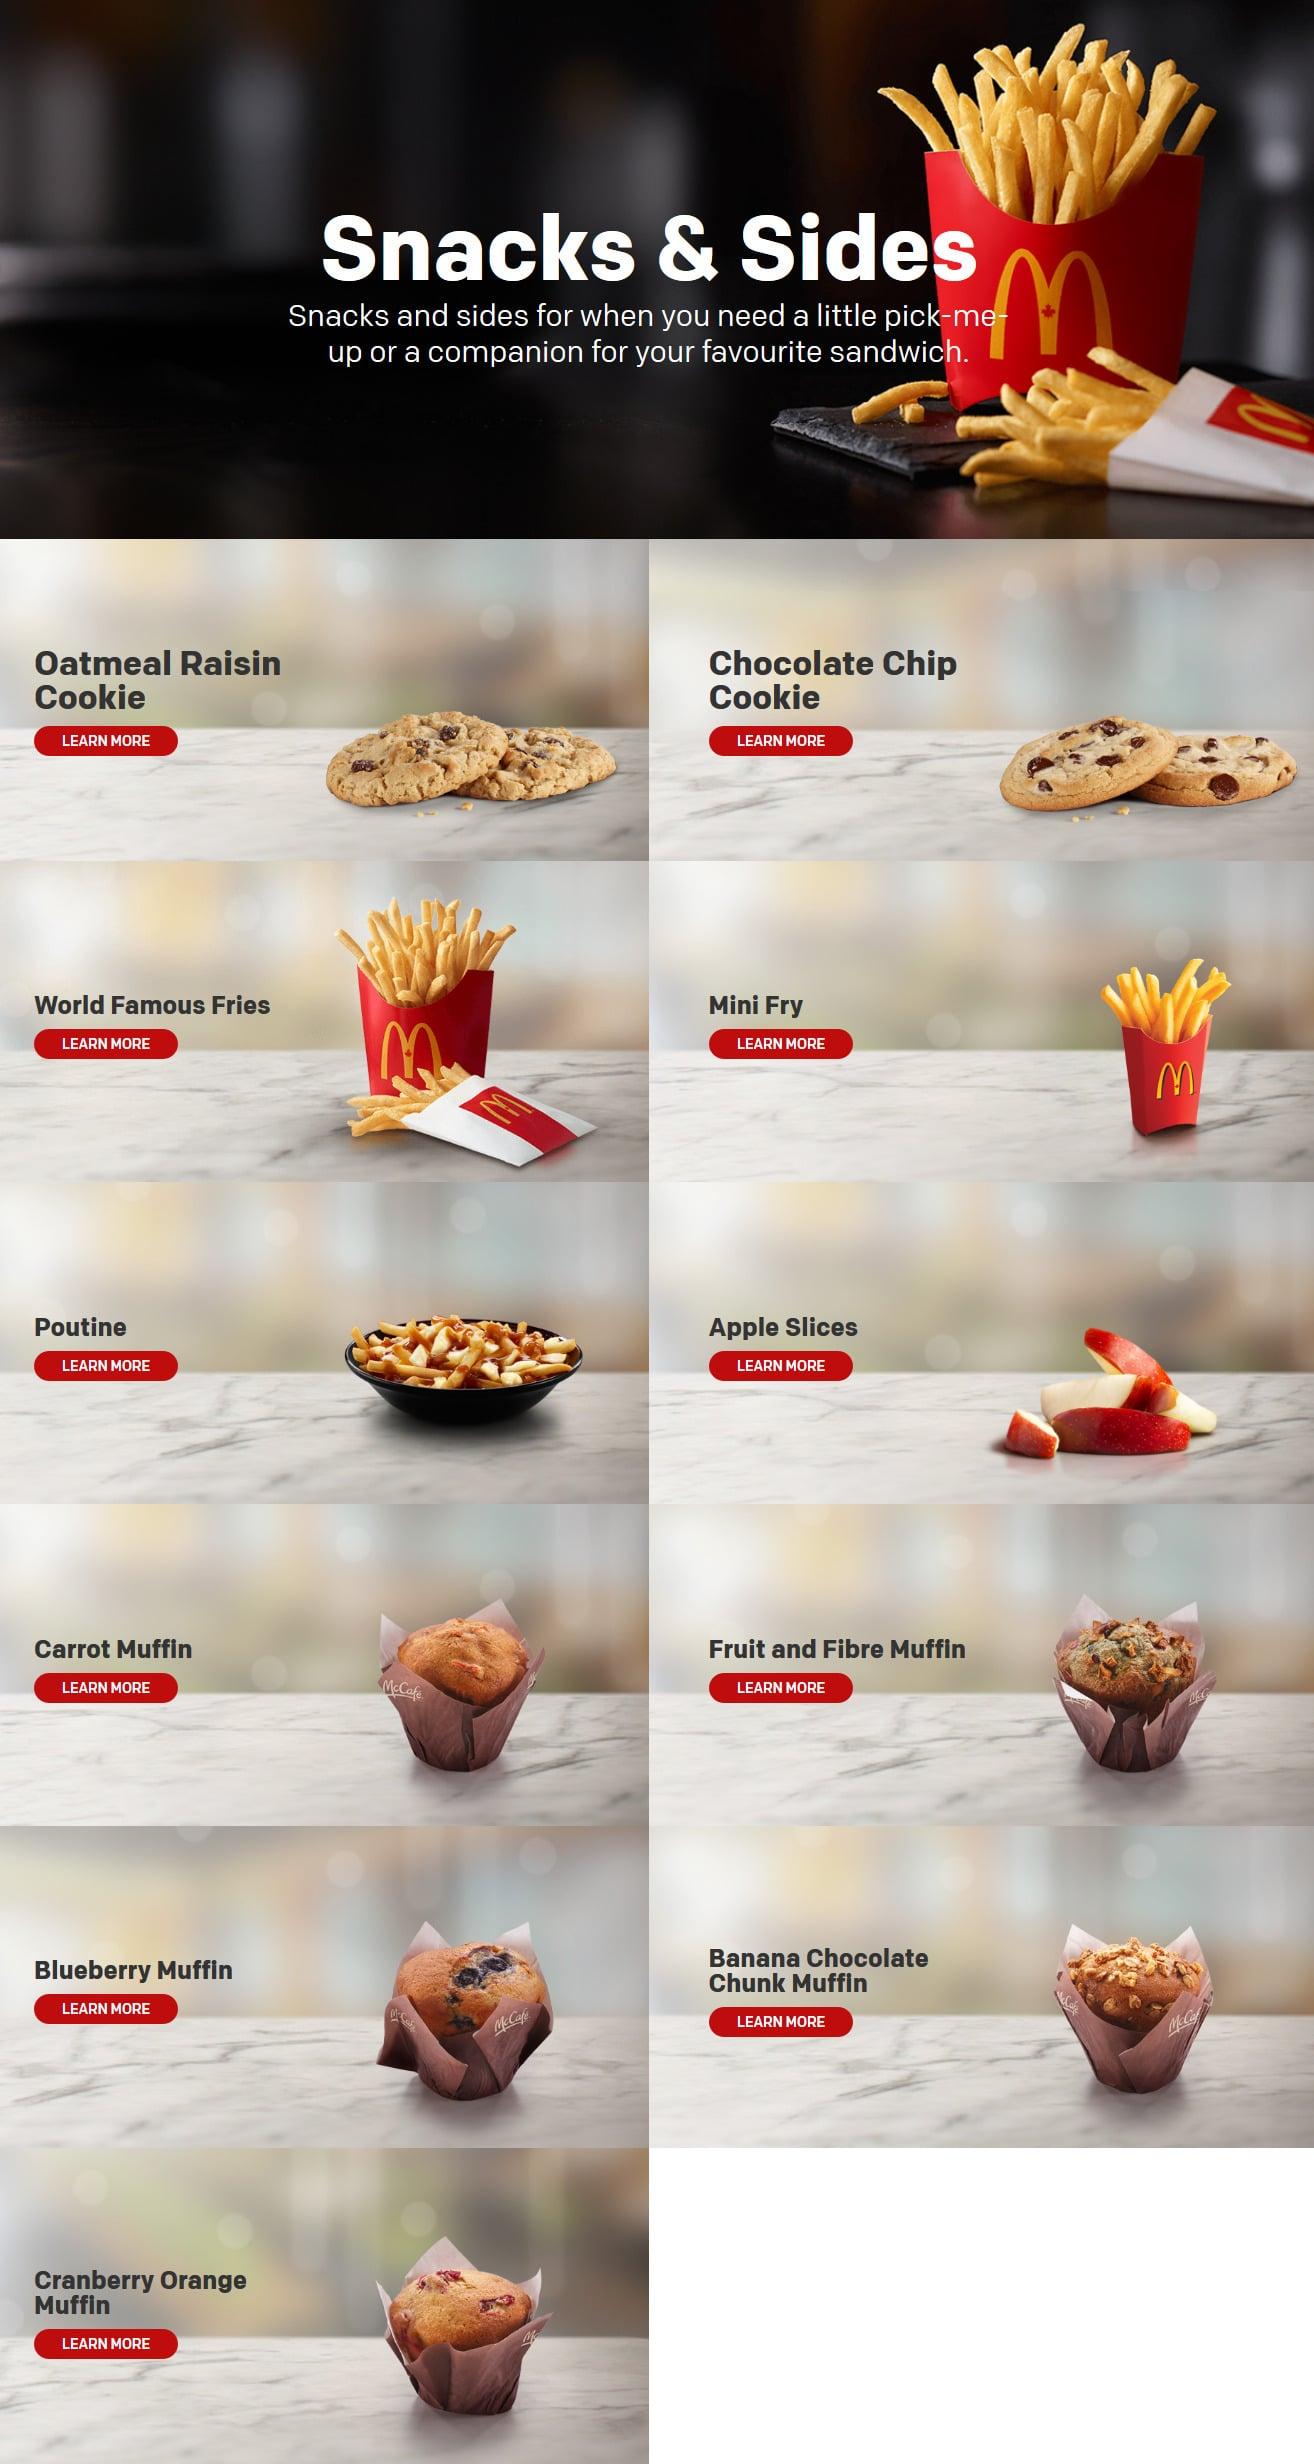 mcdonald's canada menu flyer and coupons